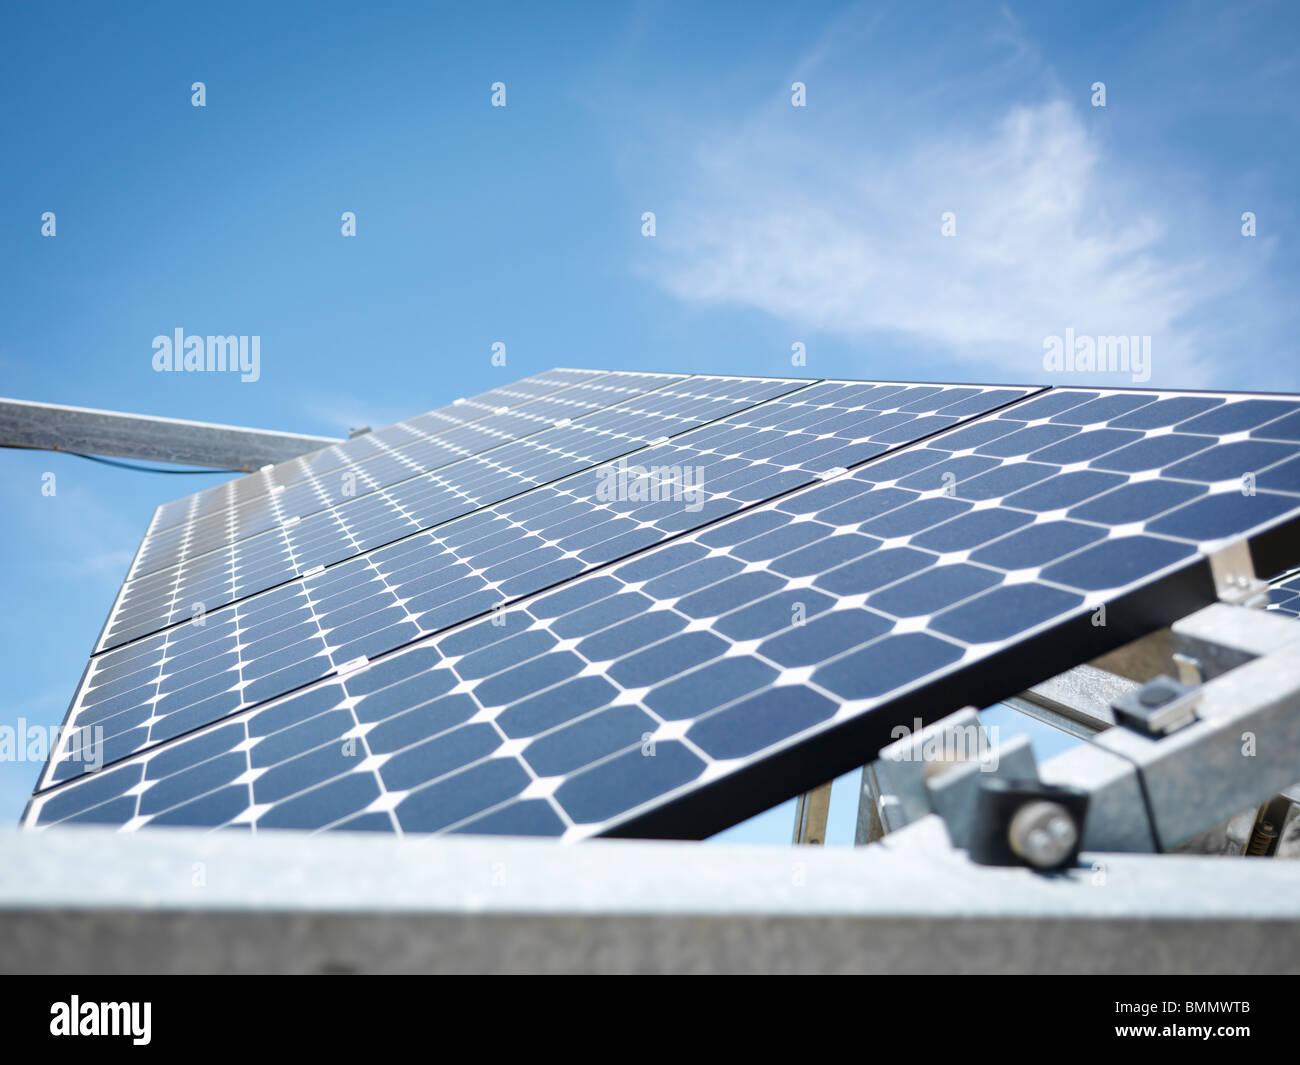 Solar power station panel close up - Stock Image